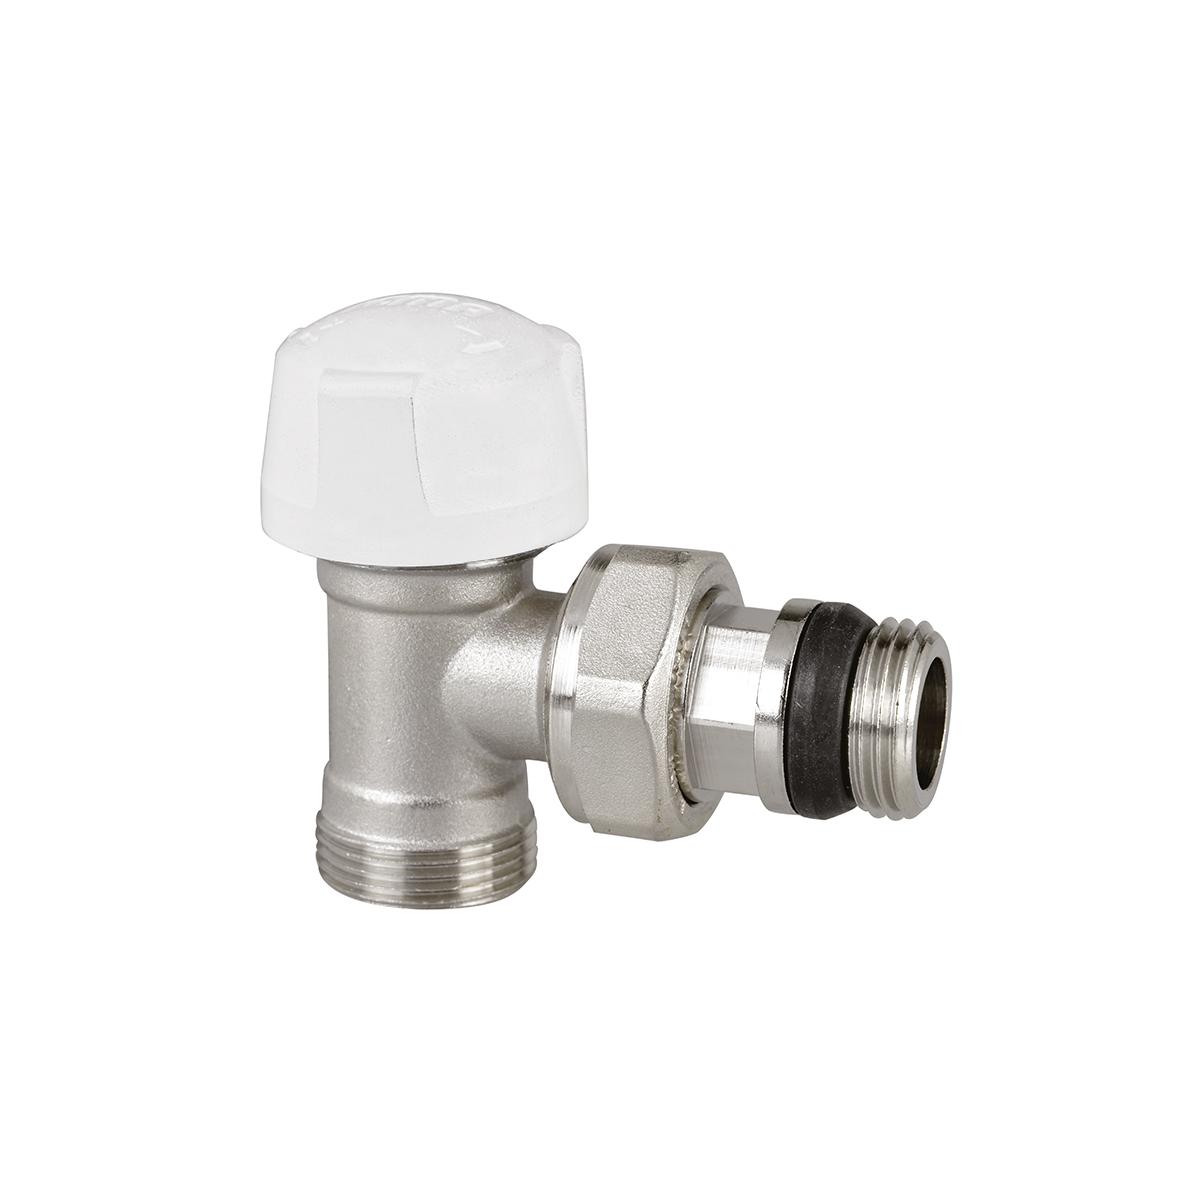 Pre-setting angle valve with thermostatic option for copper, Pex-Al-pex, pex piping